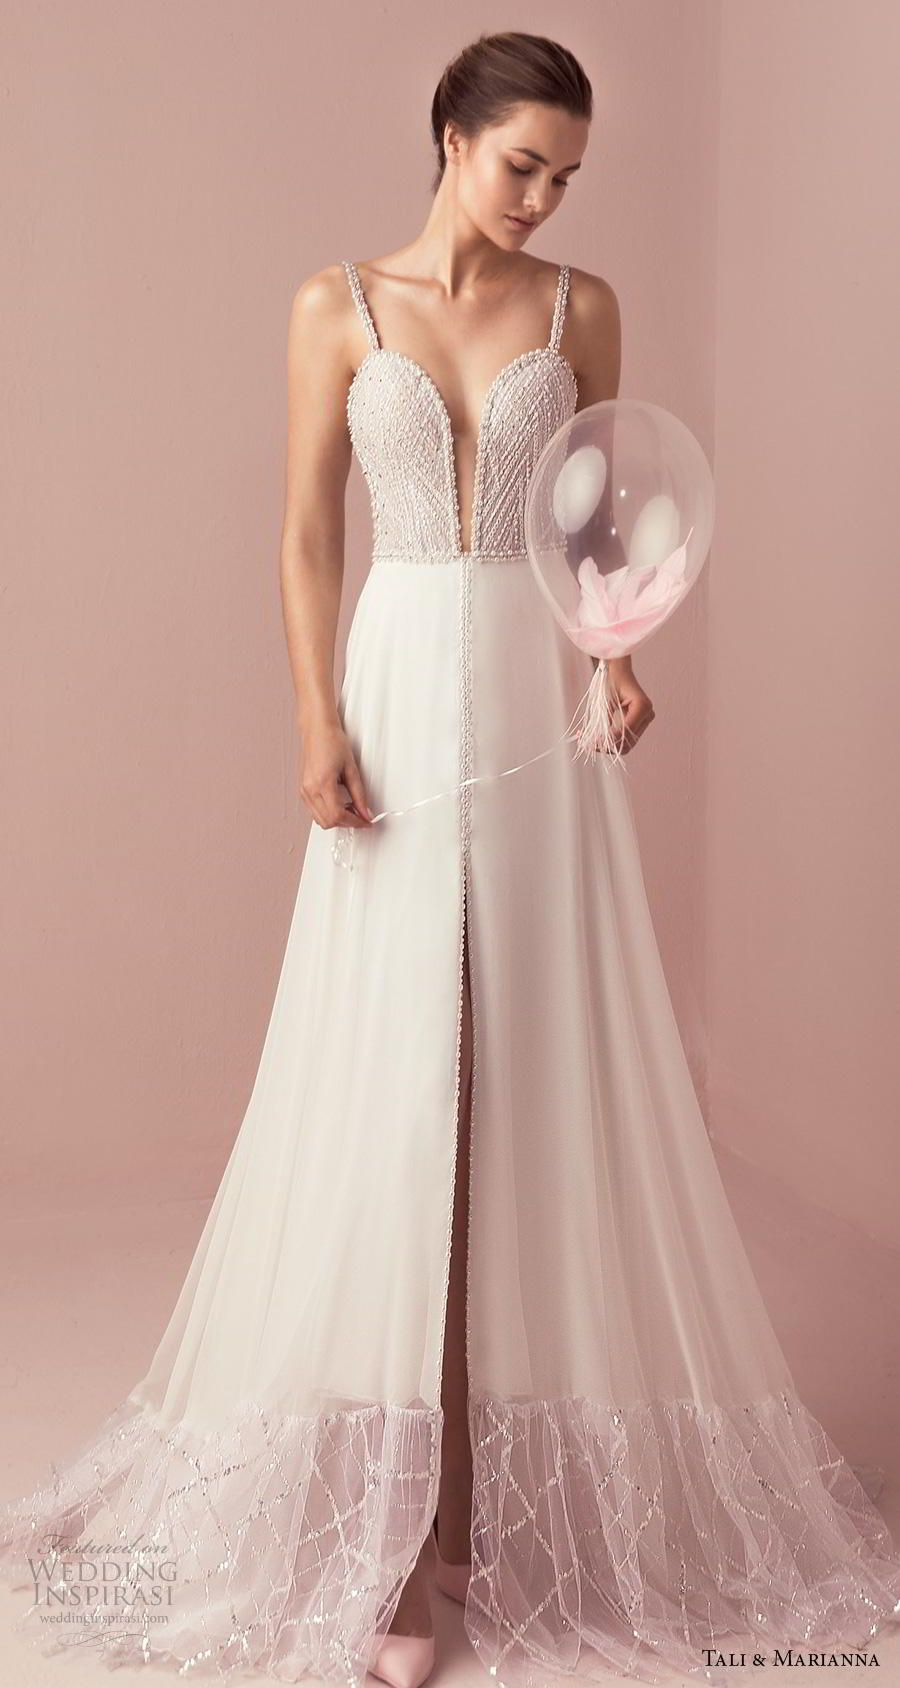 Tali u marianna wedding dresses u ucthe oneud bridal collection